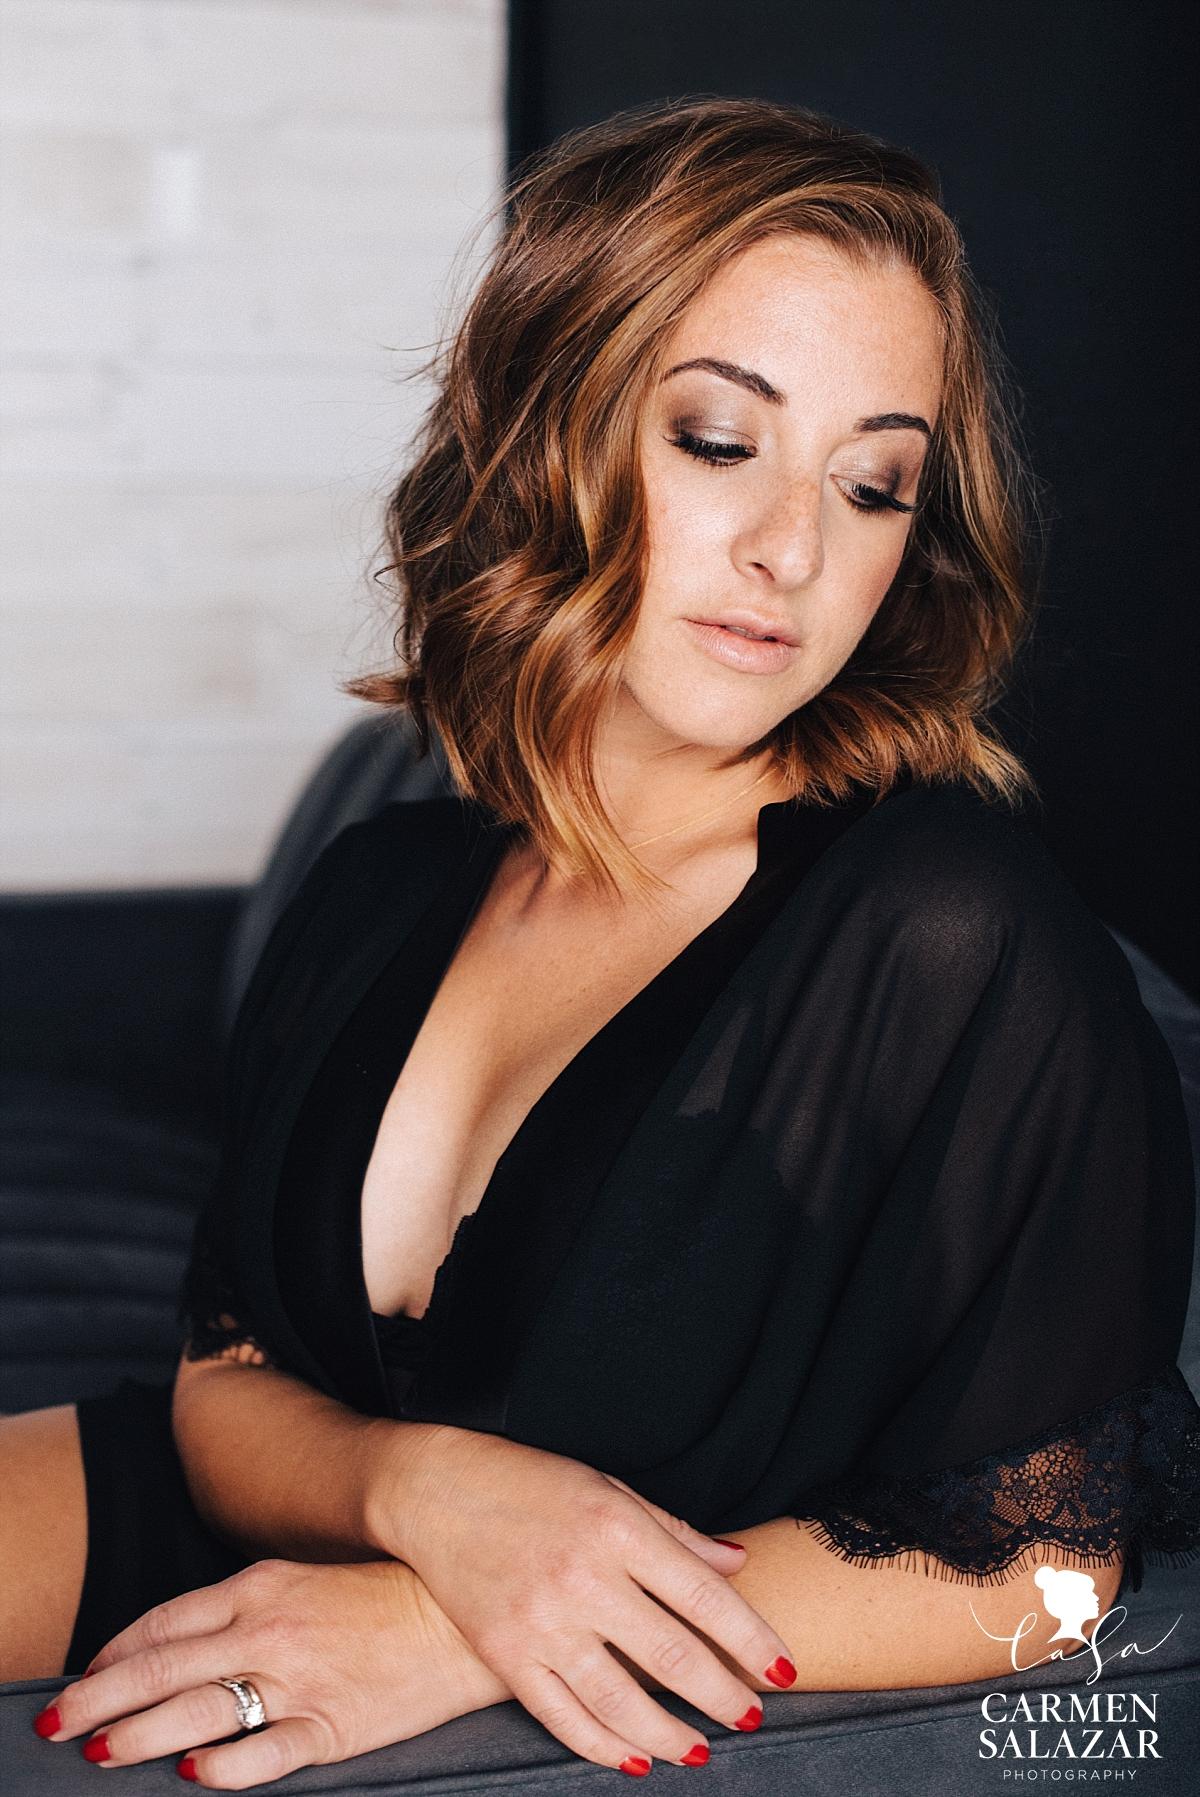 Sassy and sexy boudoir portraits - Carmen Salazar